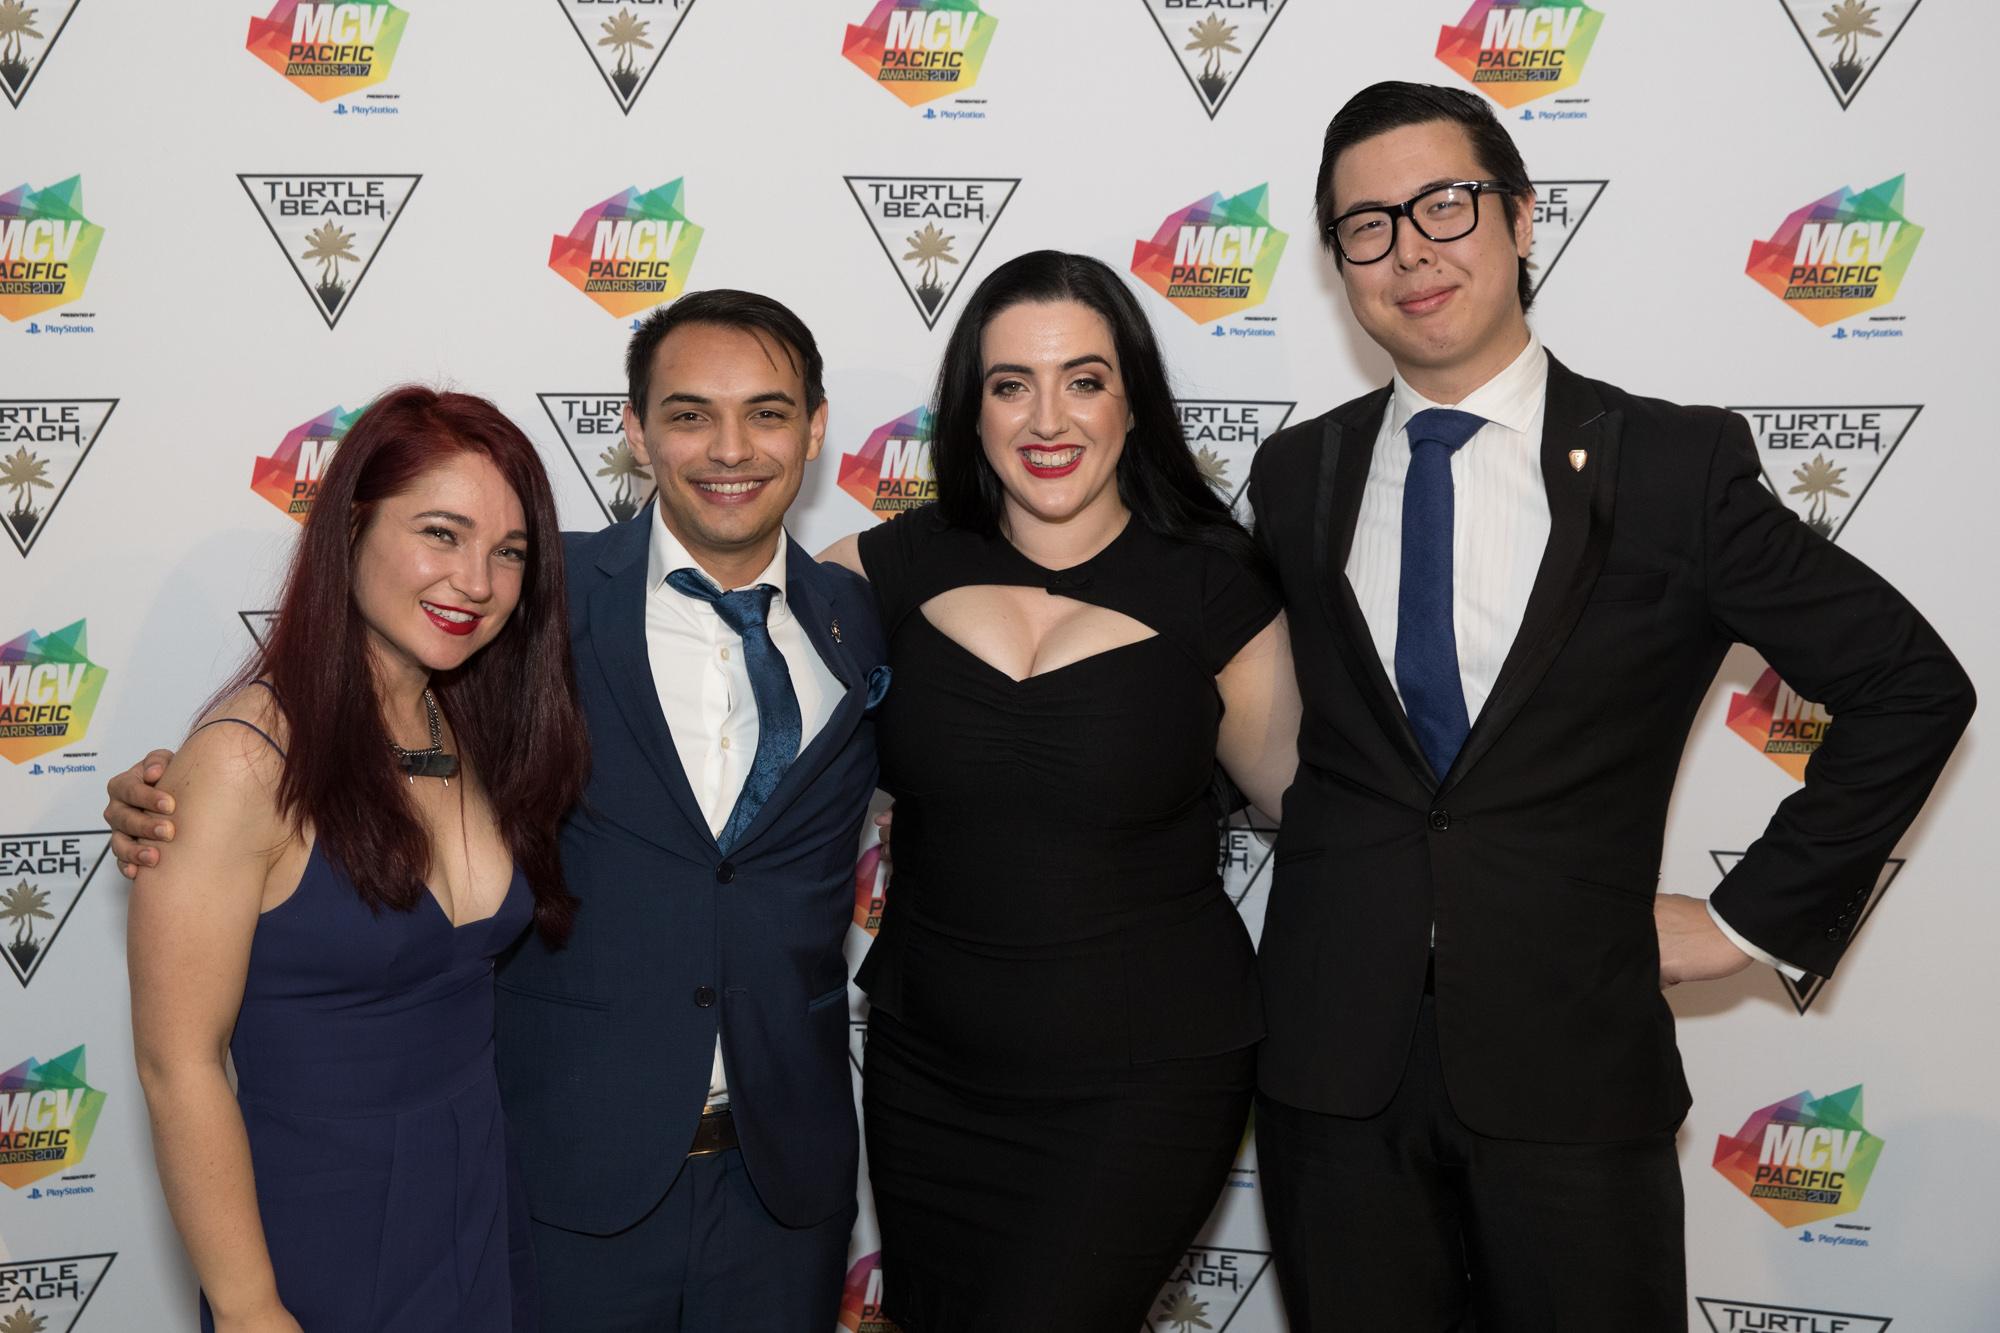 MCV_Pacific_Awards_1_June_17_PS_147.jpg